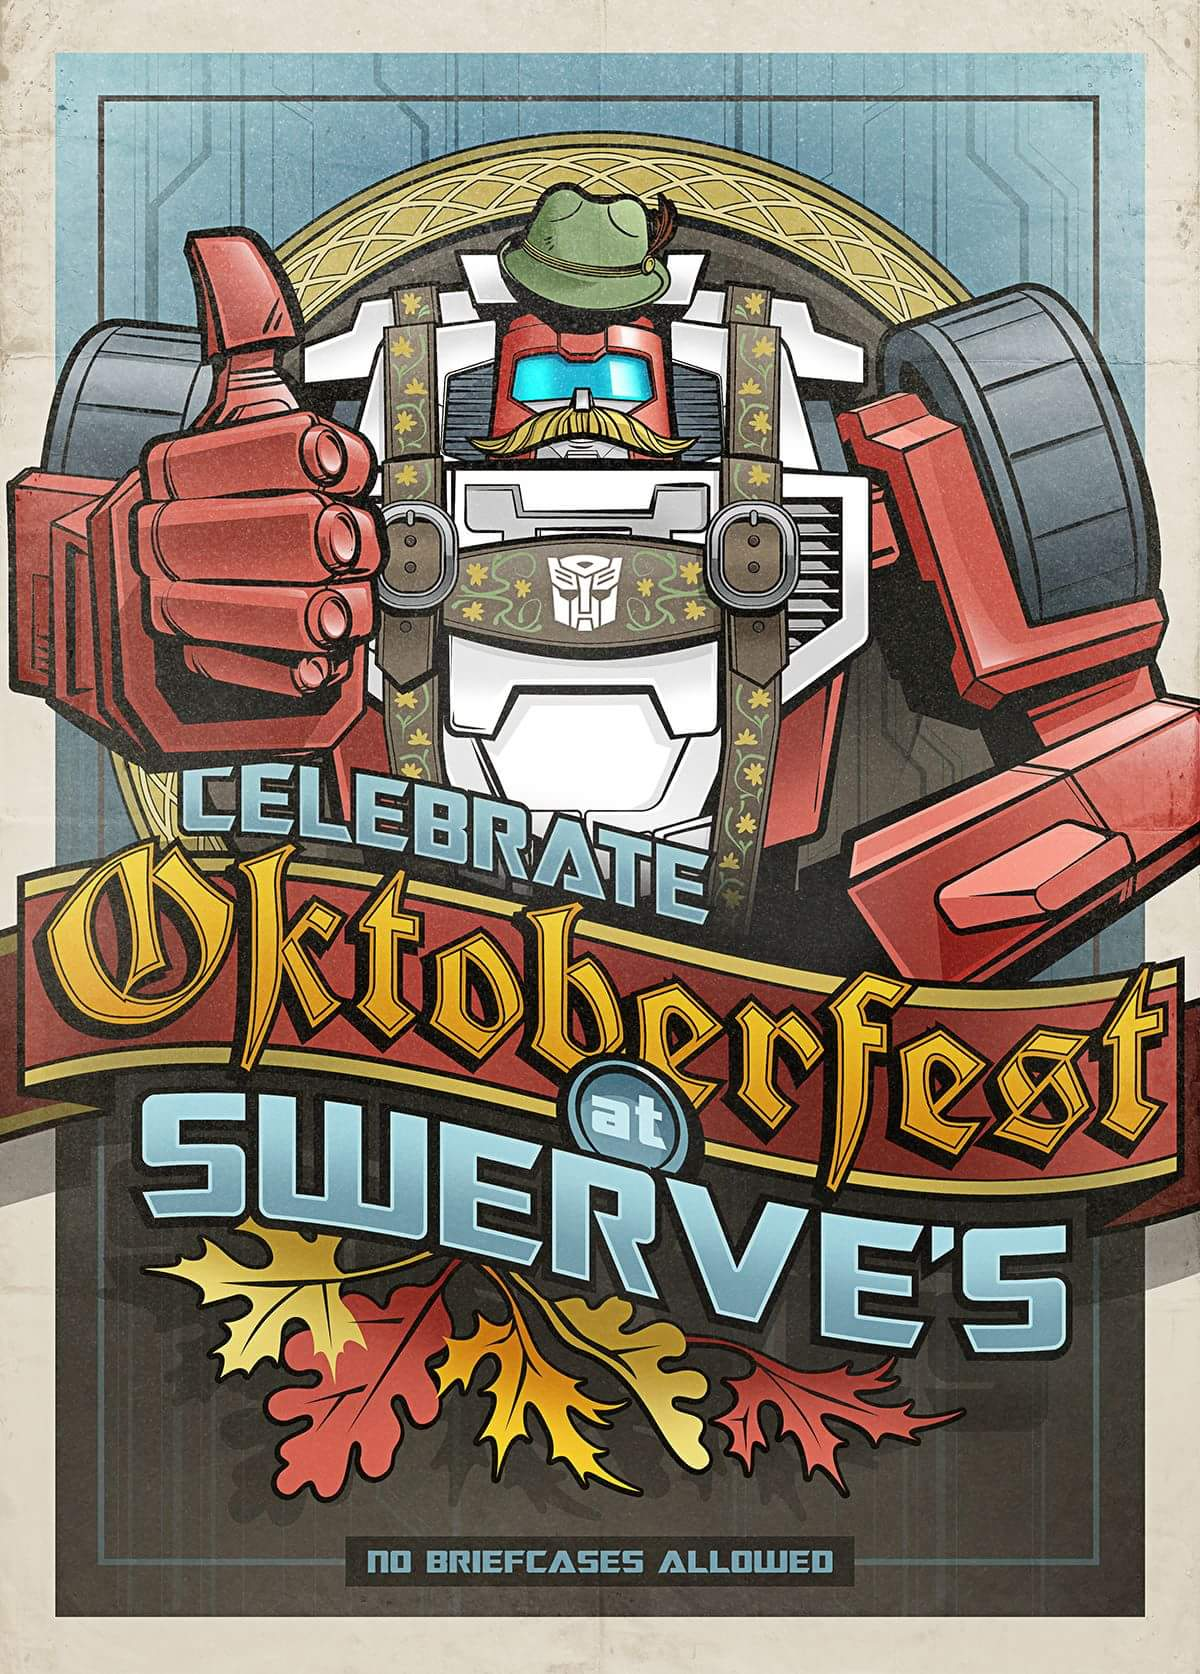 Oktoberfest Transformers Know Your Meme